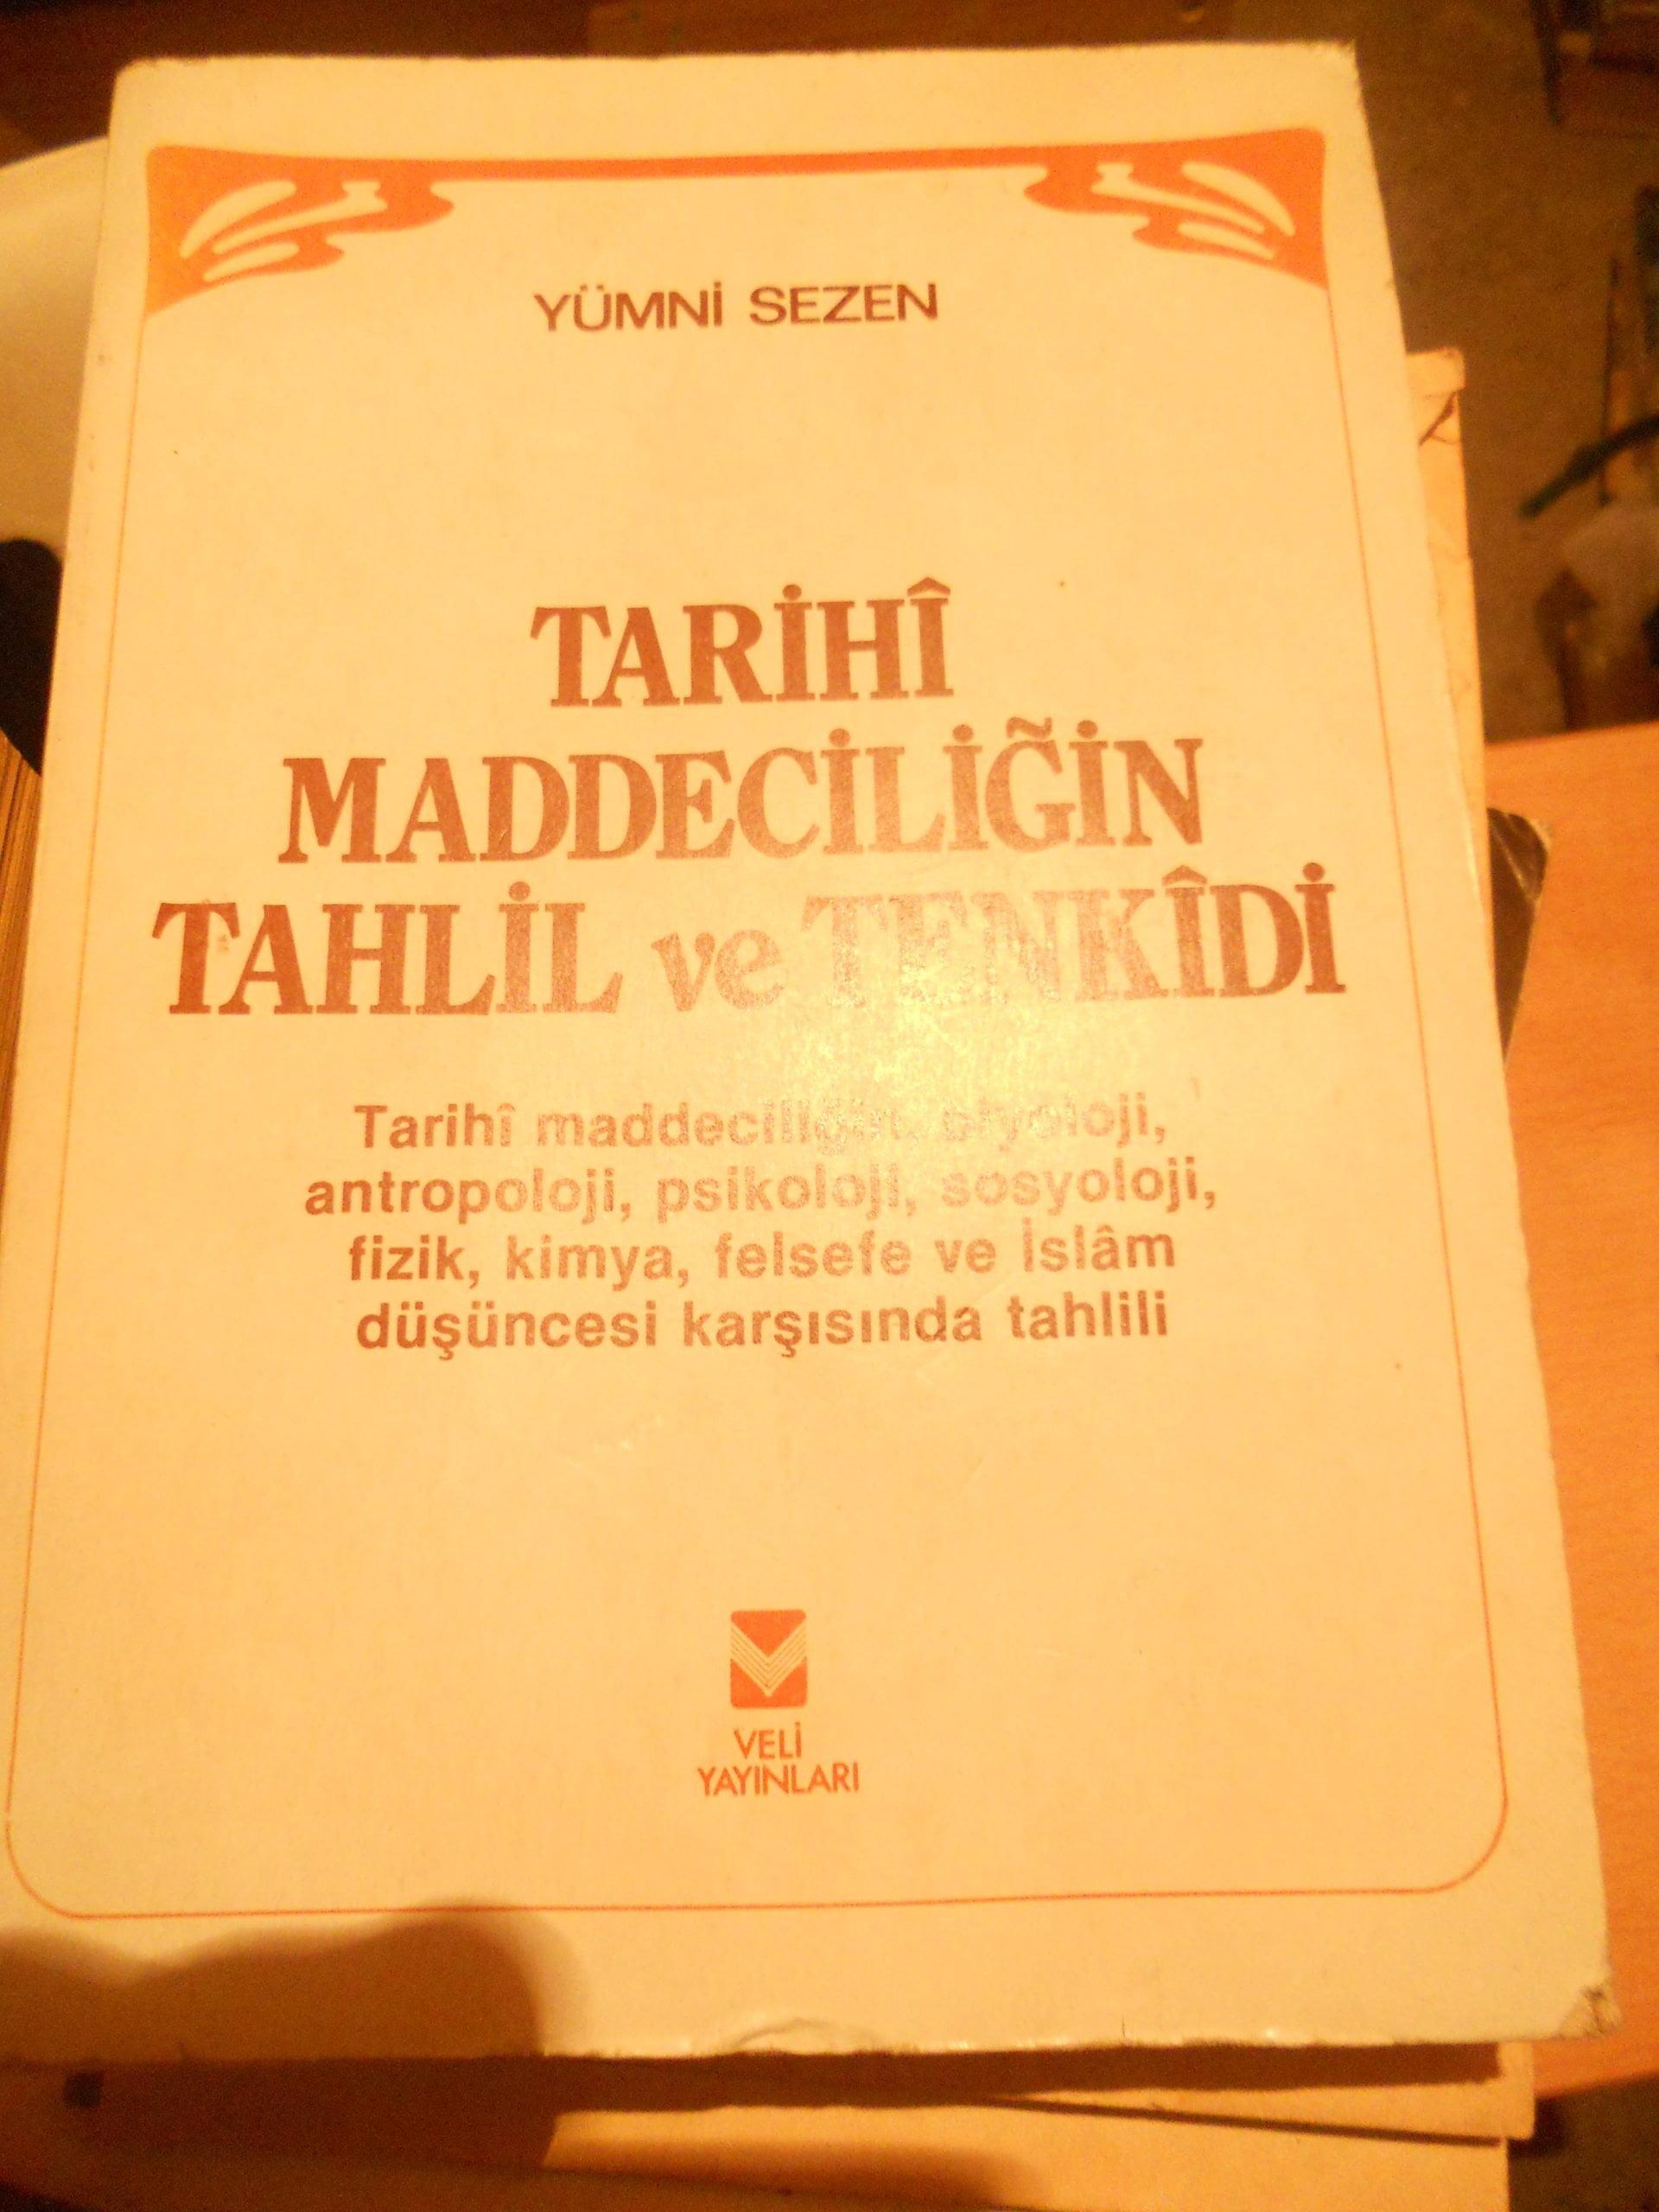 TARİHİ MADDECİLİĞİN TAHLİL VE TENKİDİ/Yümni Sezen/25 TL